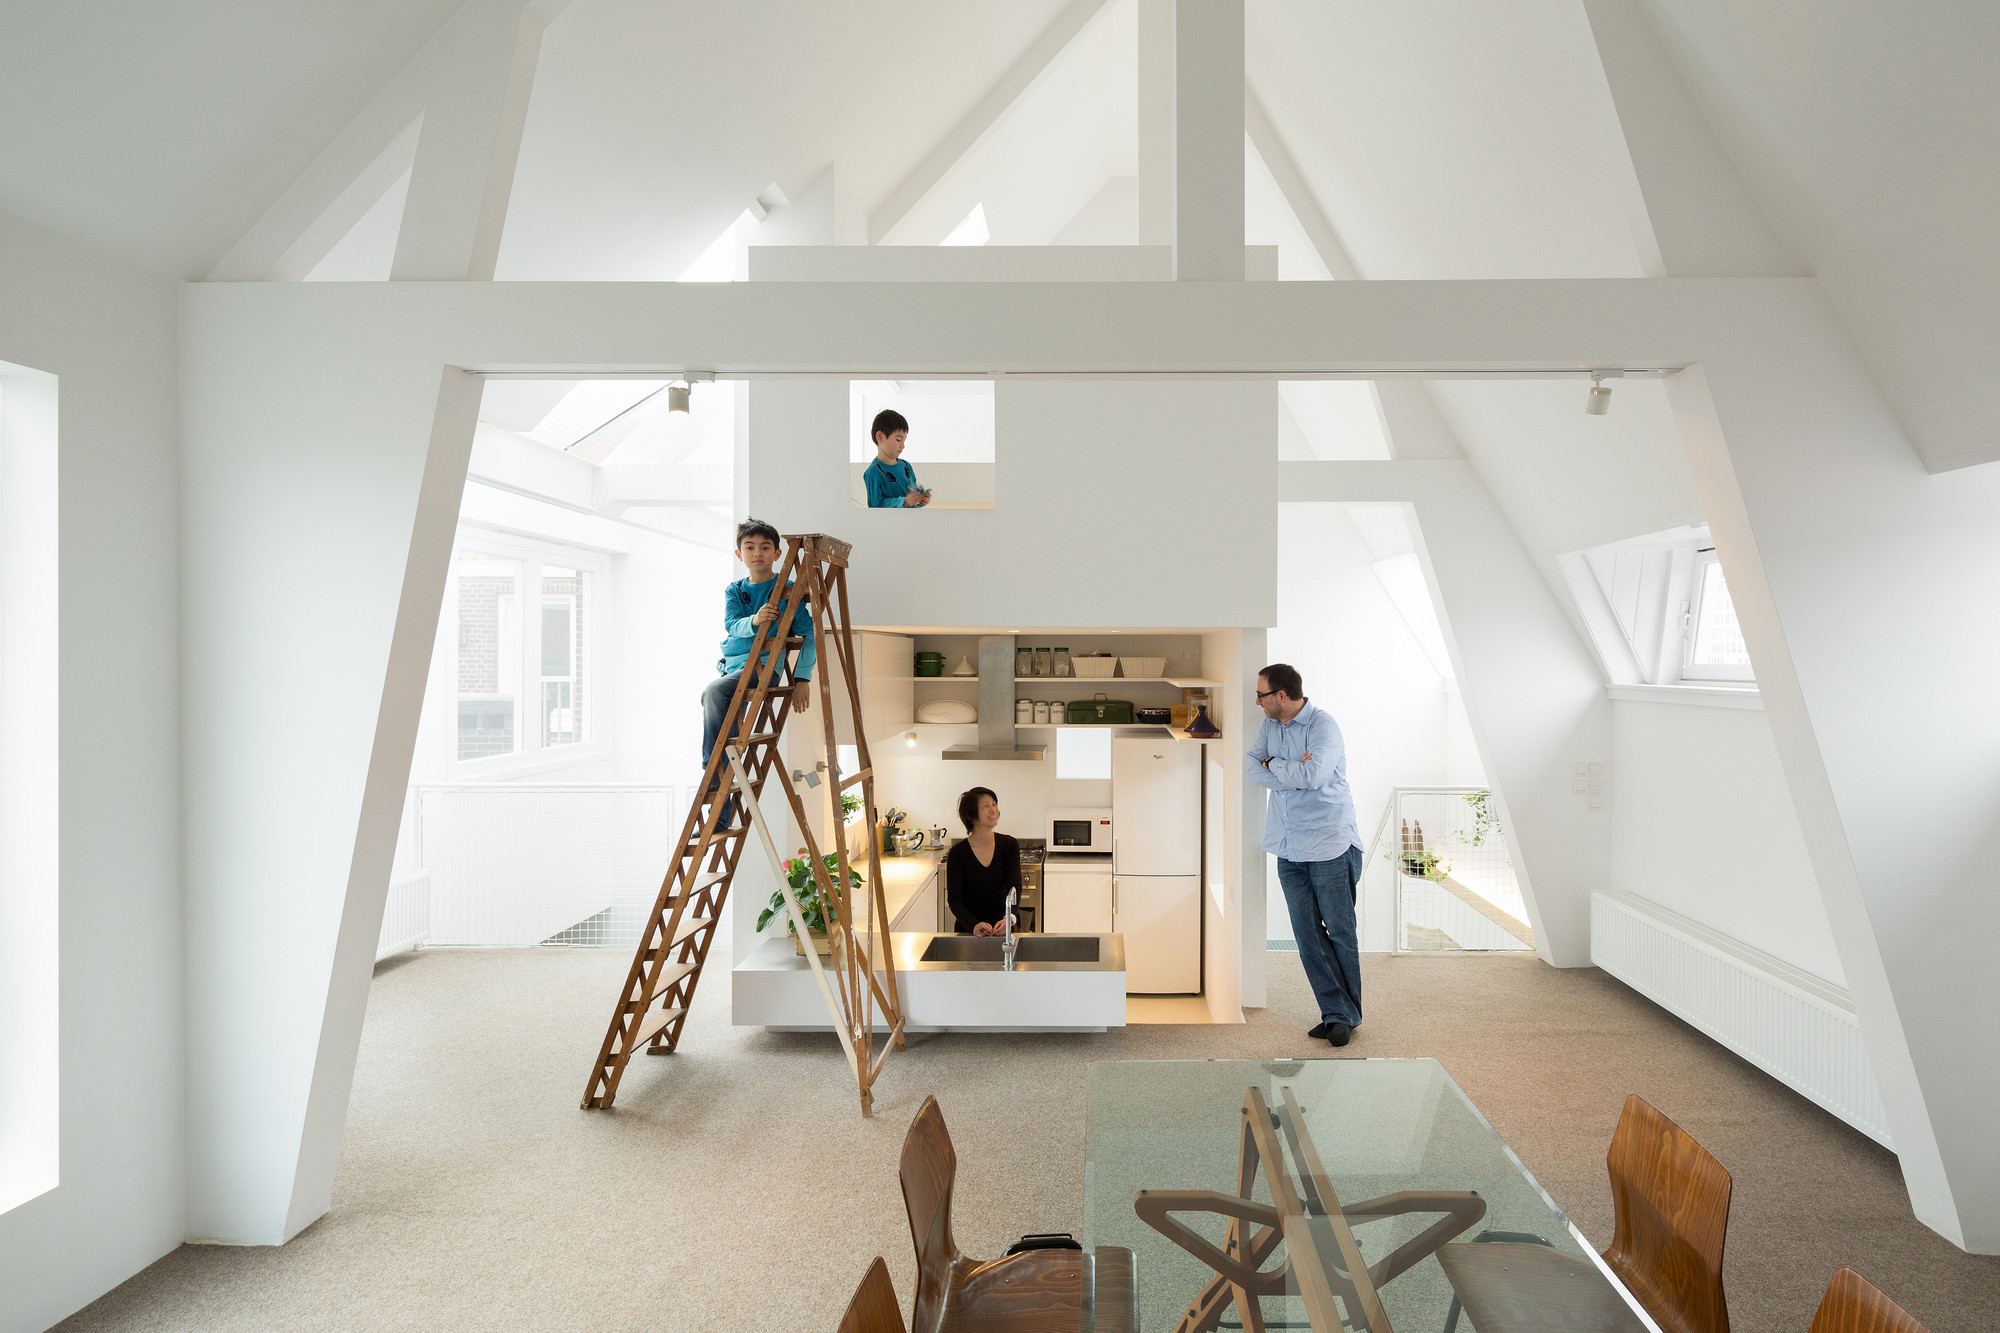 Departamento en Amsterdam / MAMM Design, © Takumi Ota